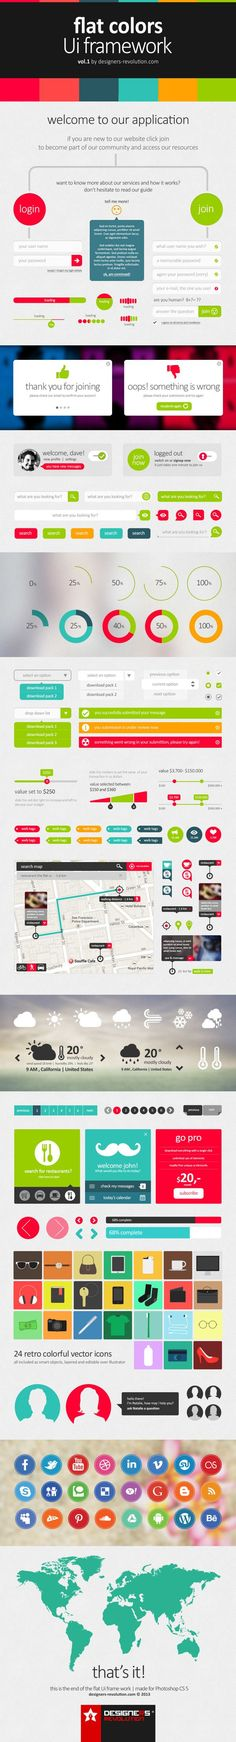 Flat Colors UI Framework PSD by Designers Revolution, via Behance